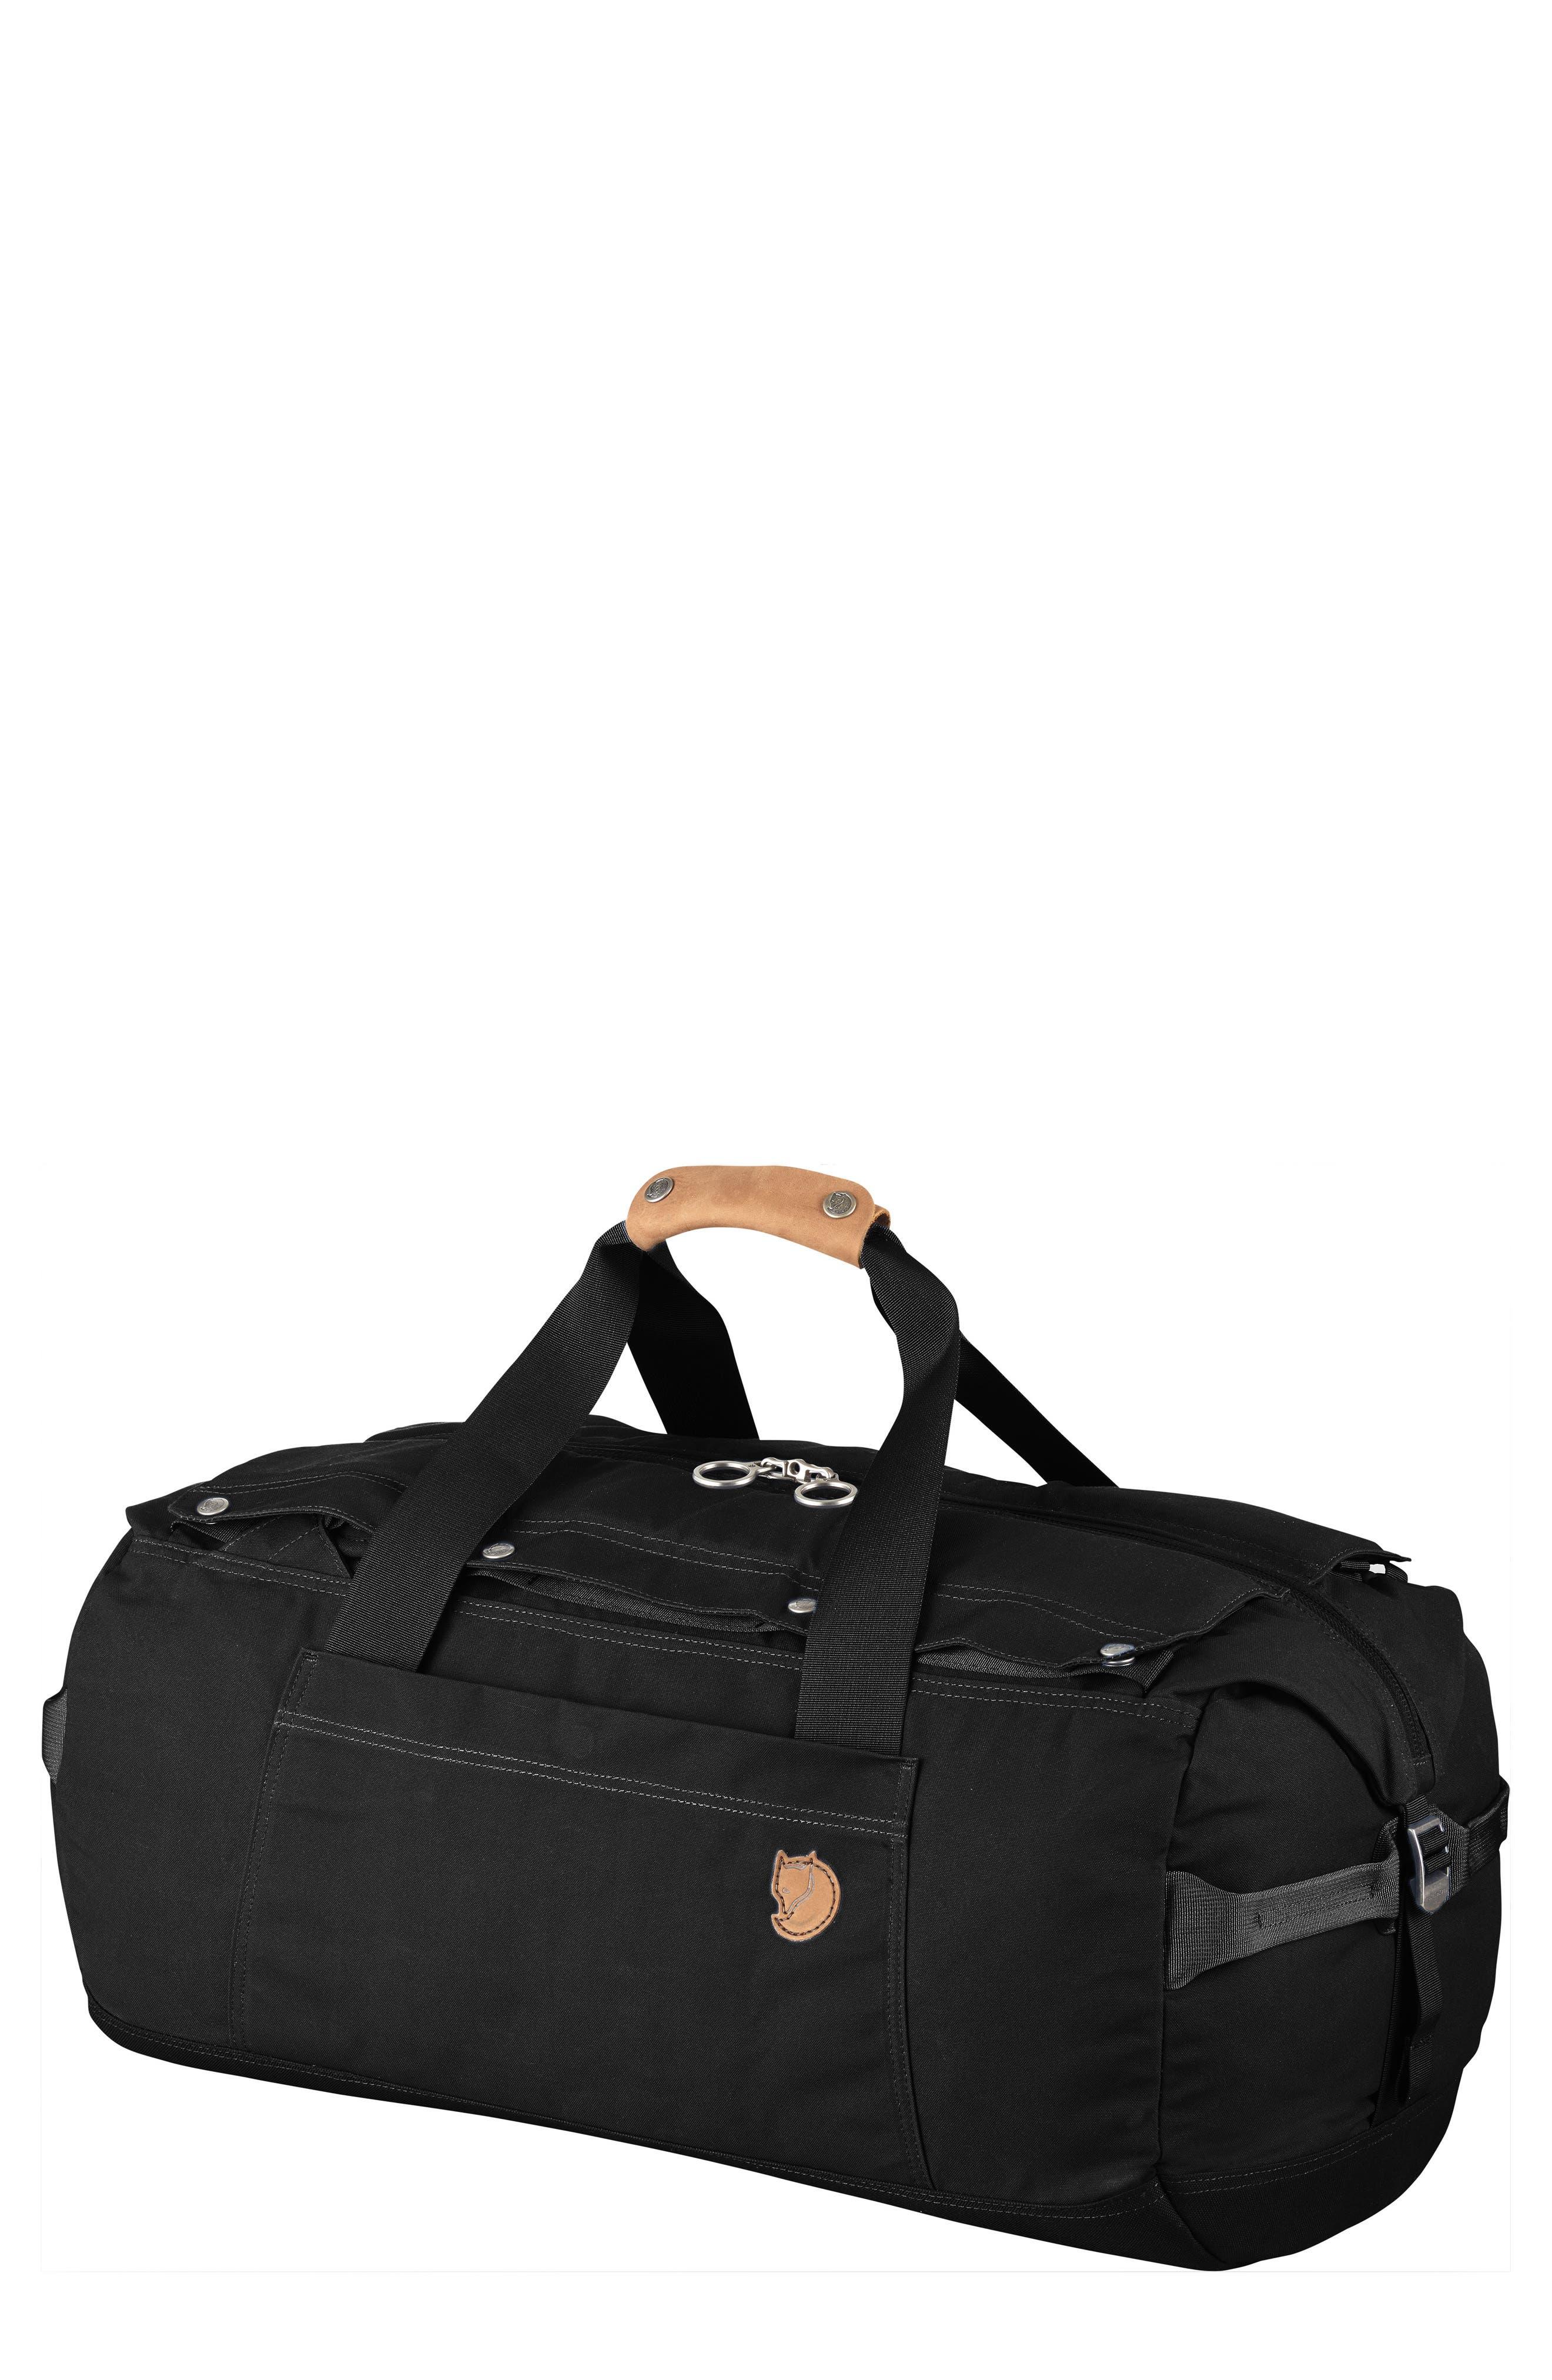 Duffel No. 6 Convertible Duffel Bag,                             Main thumbnail 1, color,                             BLACK